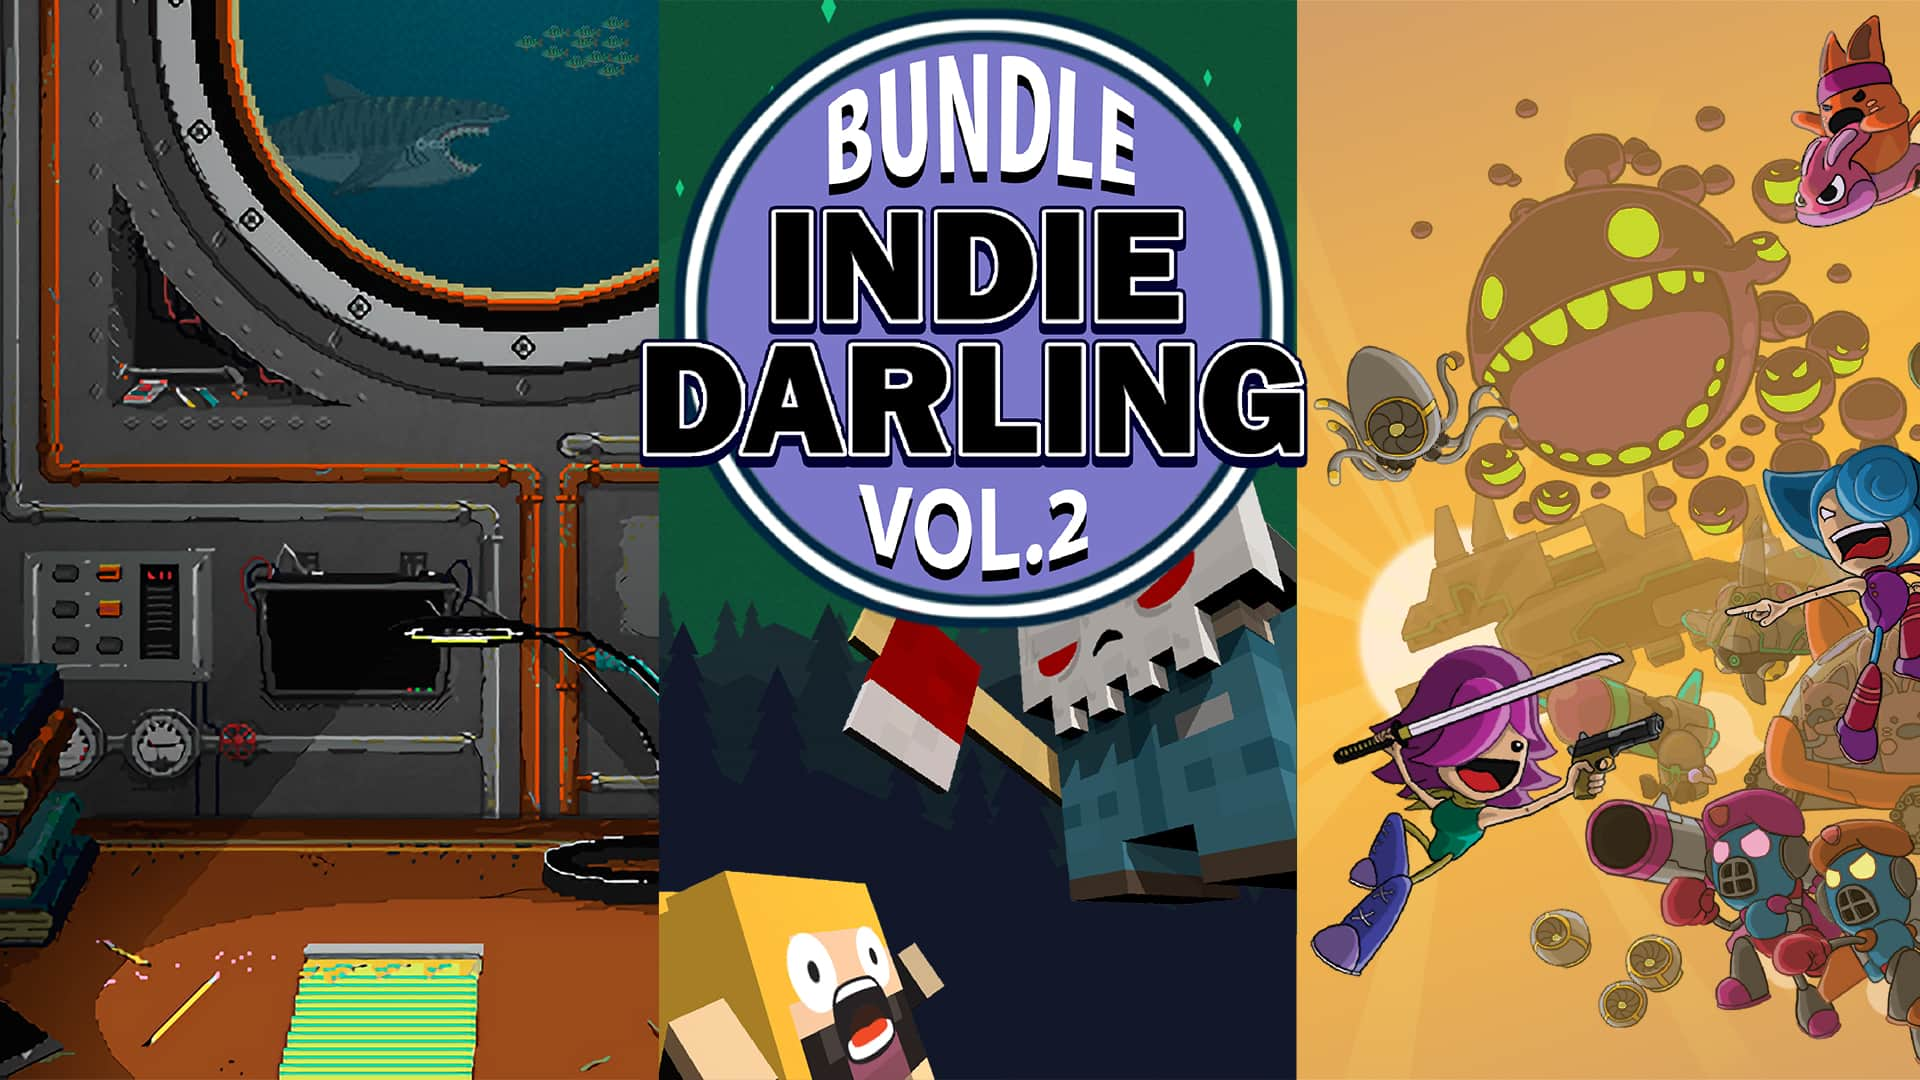 Nintendo Switch eShop: Indie Darling Bundle Vol 2 for $6.99 (80% OFF)